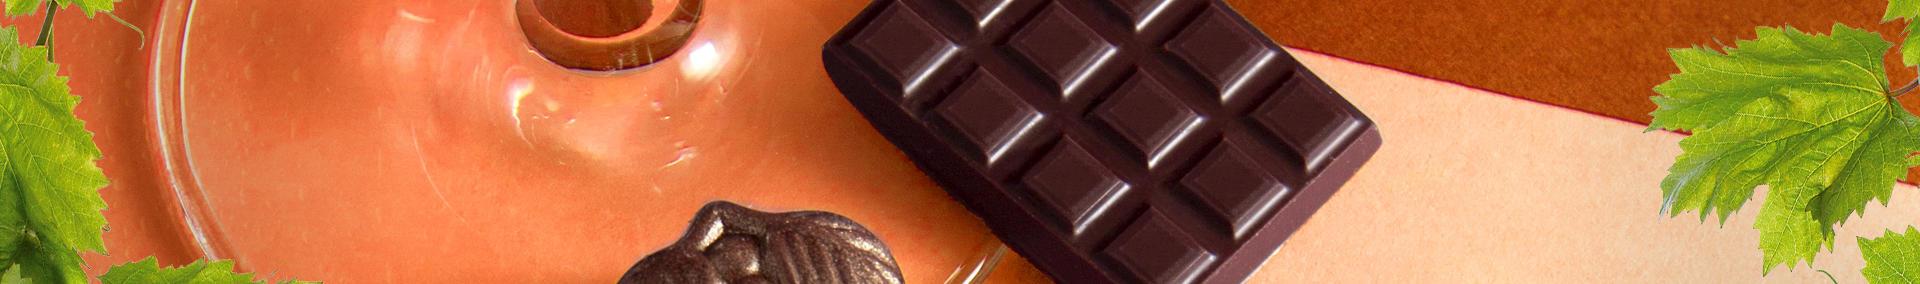 Inscription Vin & Chocolat